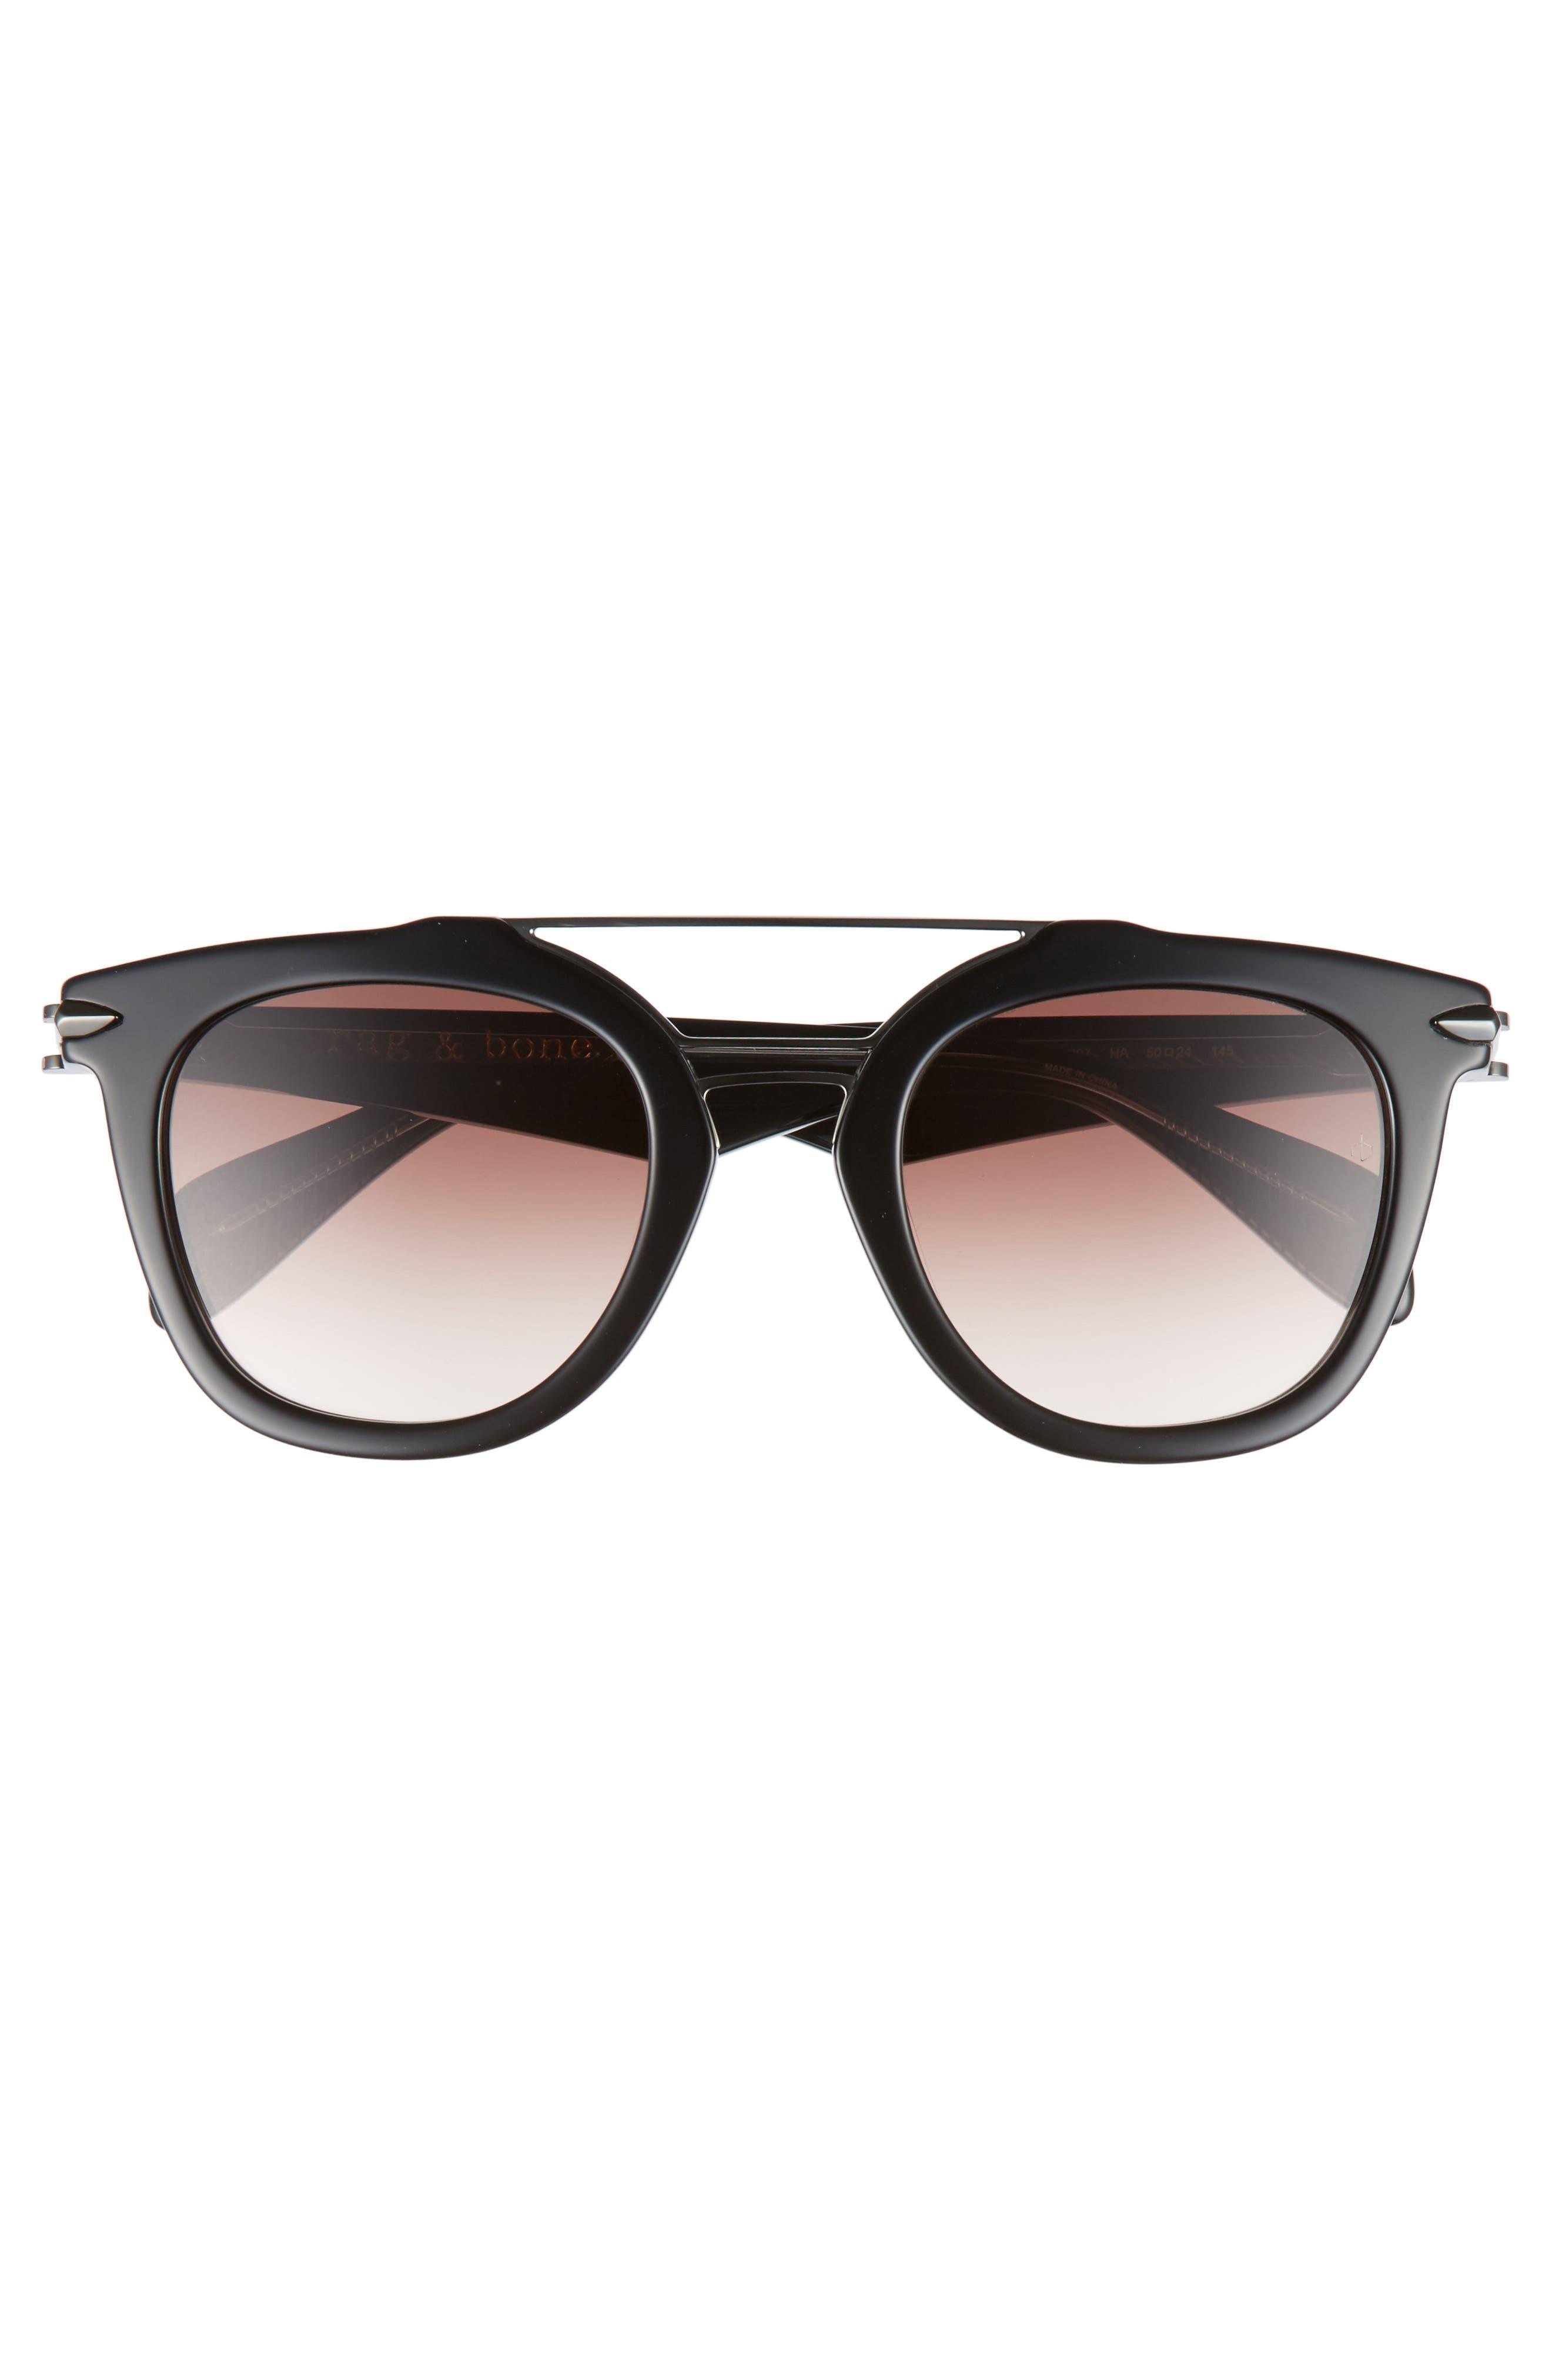 50mm Round Aviator Sunglasses,                             Alternate thumbnail 3, color,                             BLACK